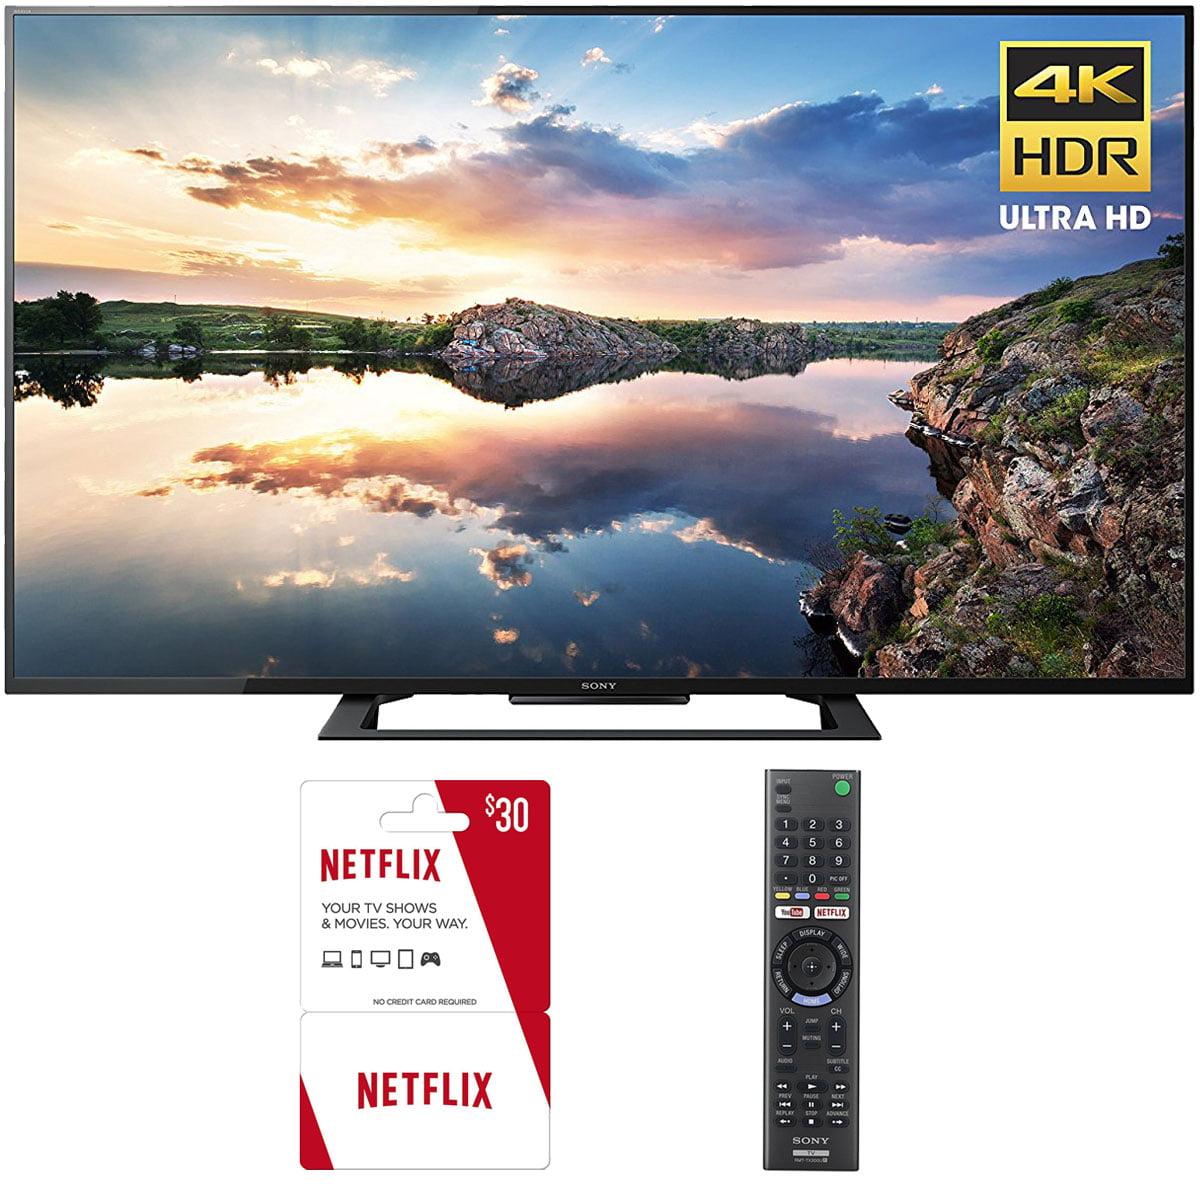 Sony KD60X690E 60-Inch 4K Ultra HD Smart LED TV (2017) Plus 3 Free Months of Netflix by Sony